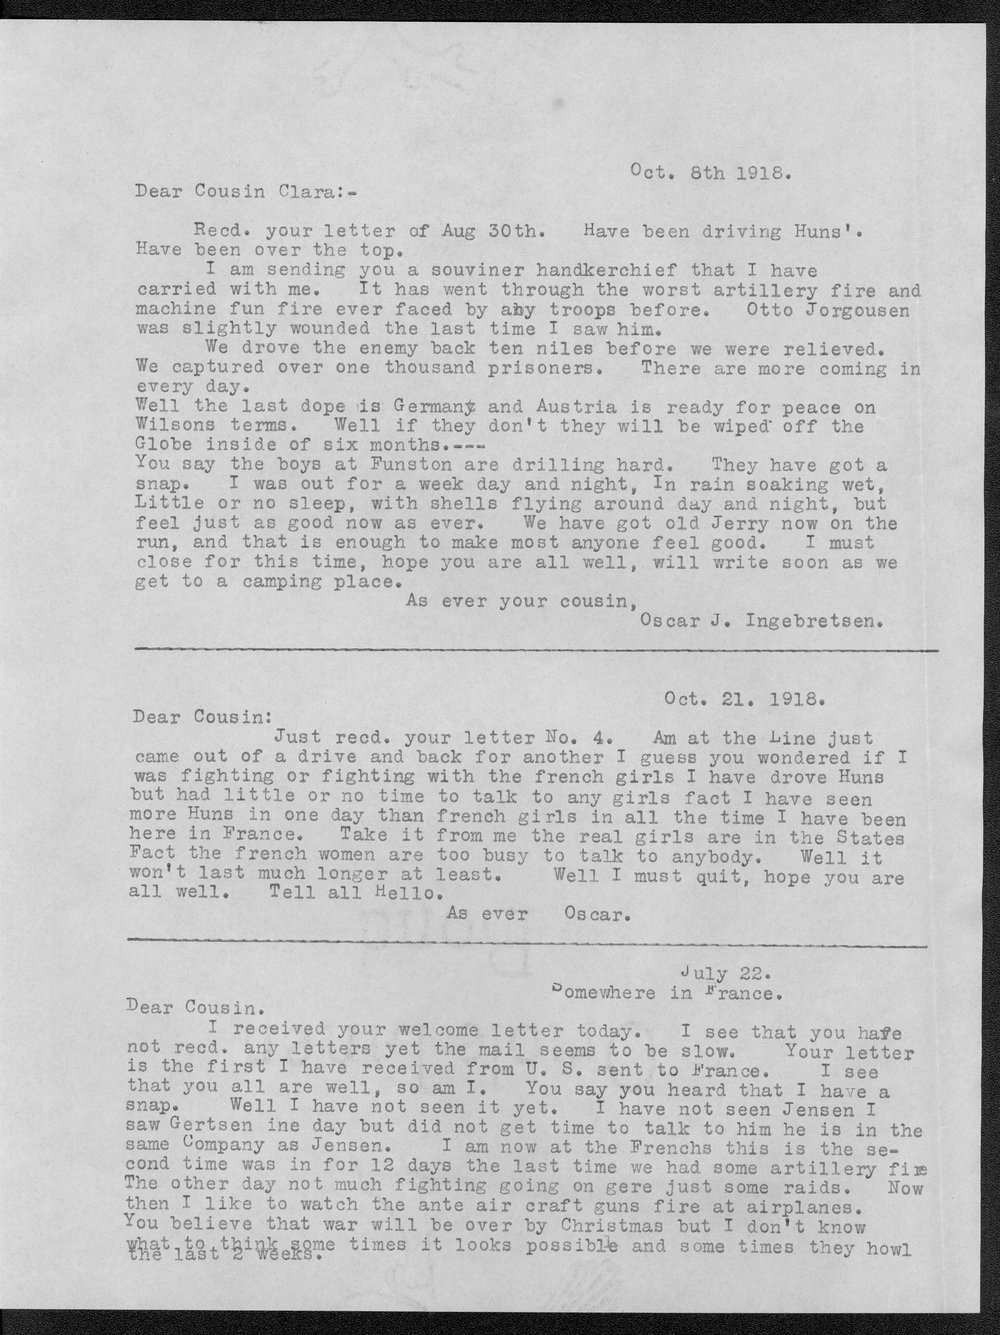 Oscar J. Ingebretsen, World War I soldier - 9